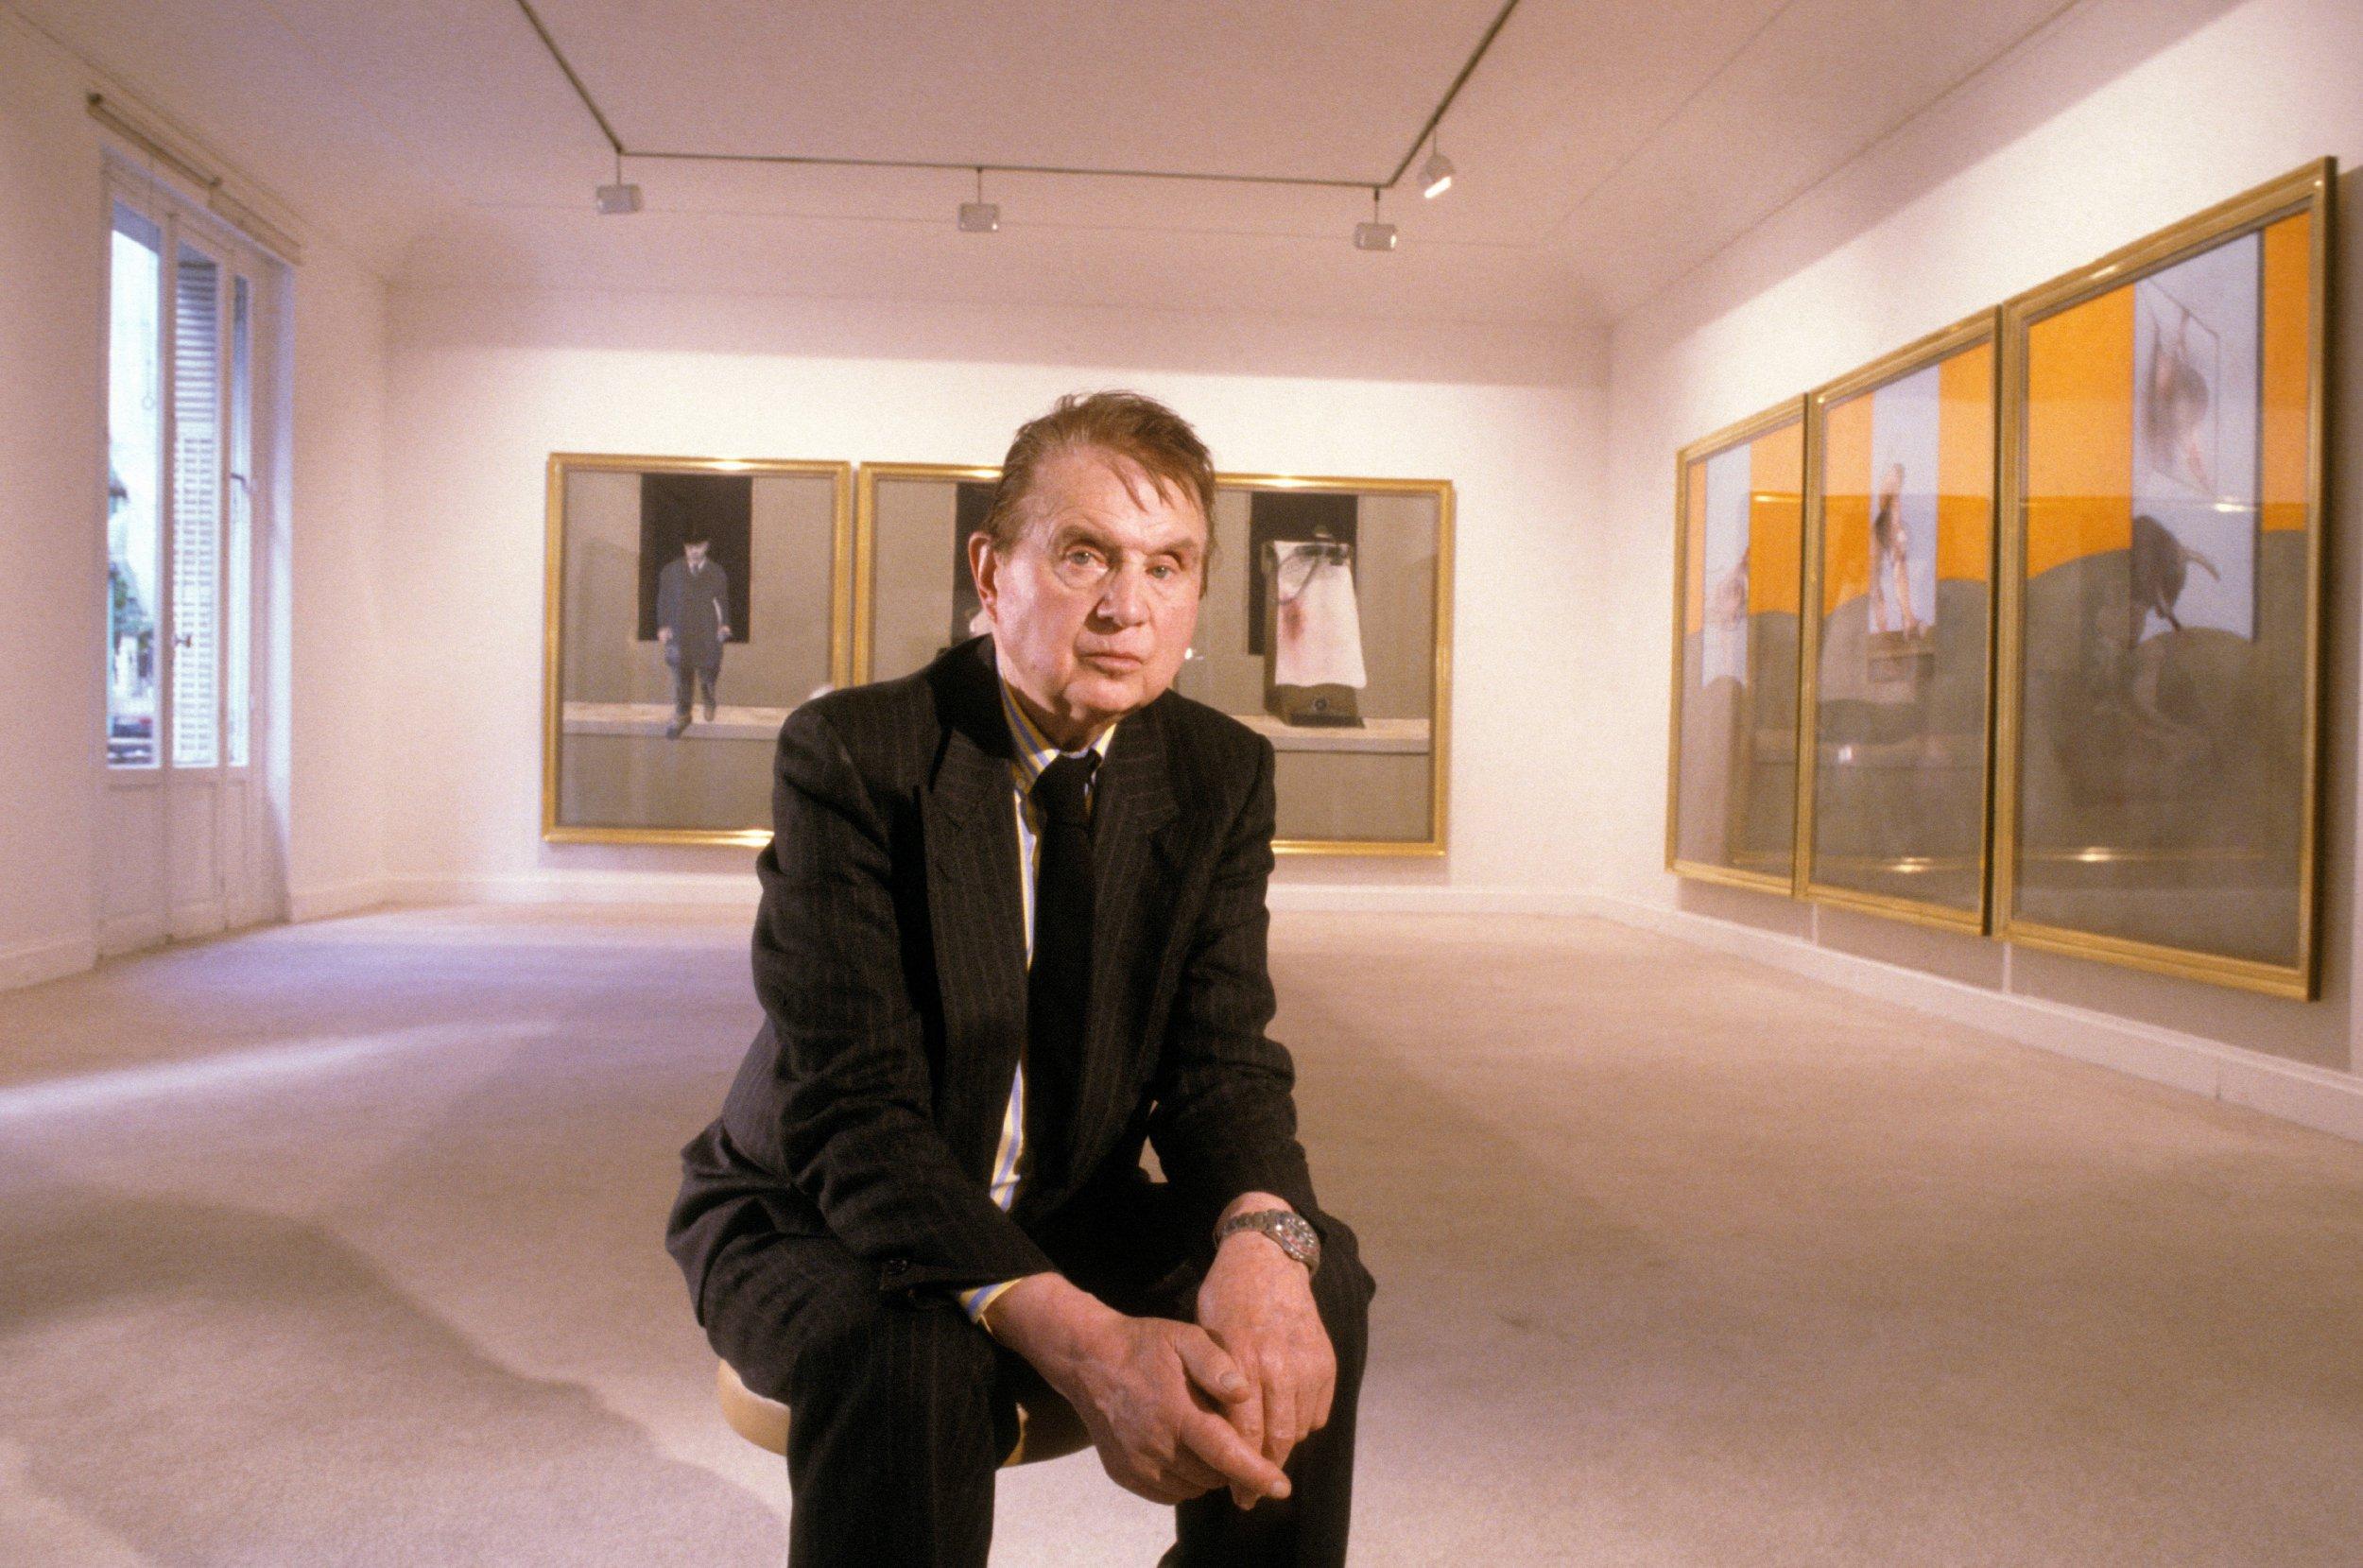 Conversation | Francis Bacon: Revelations